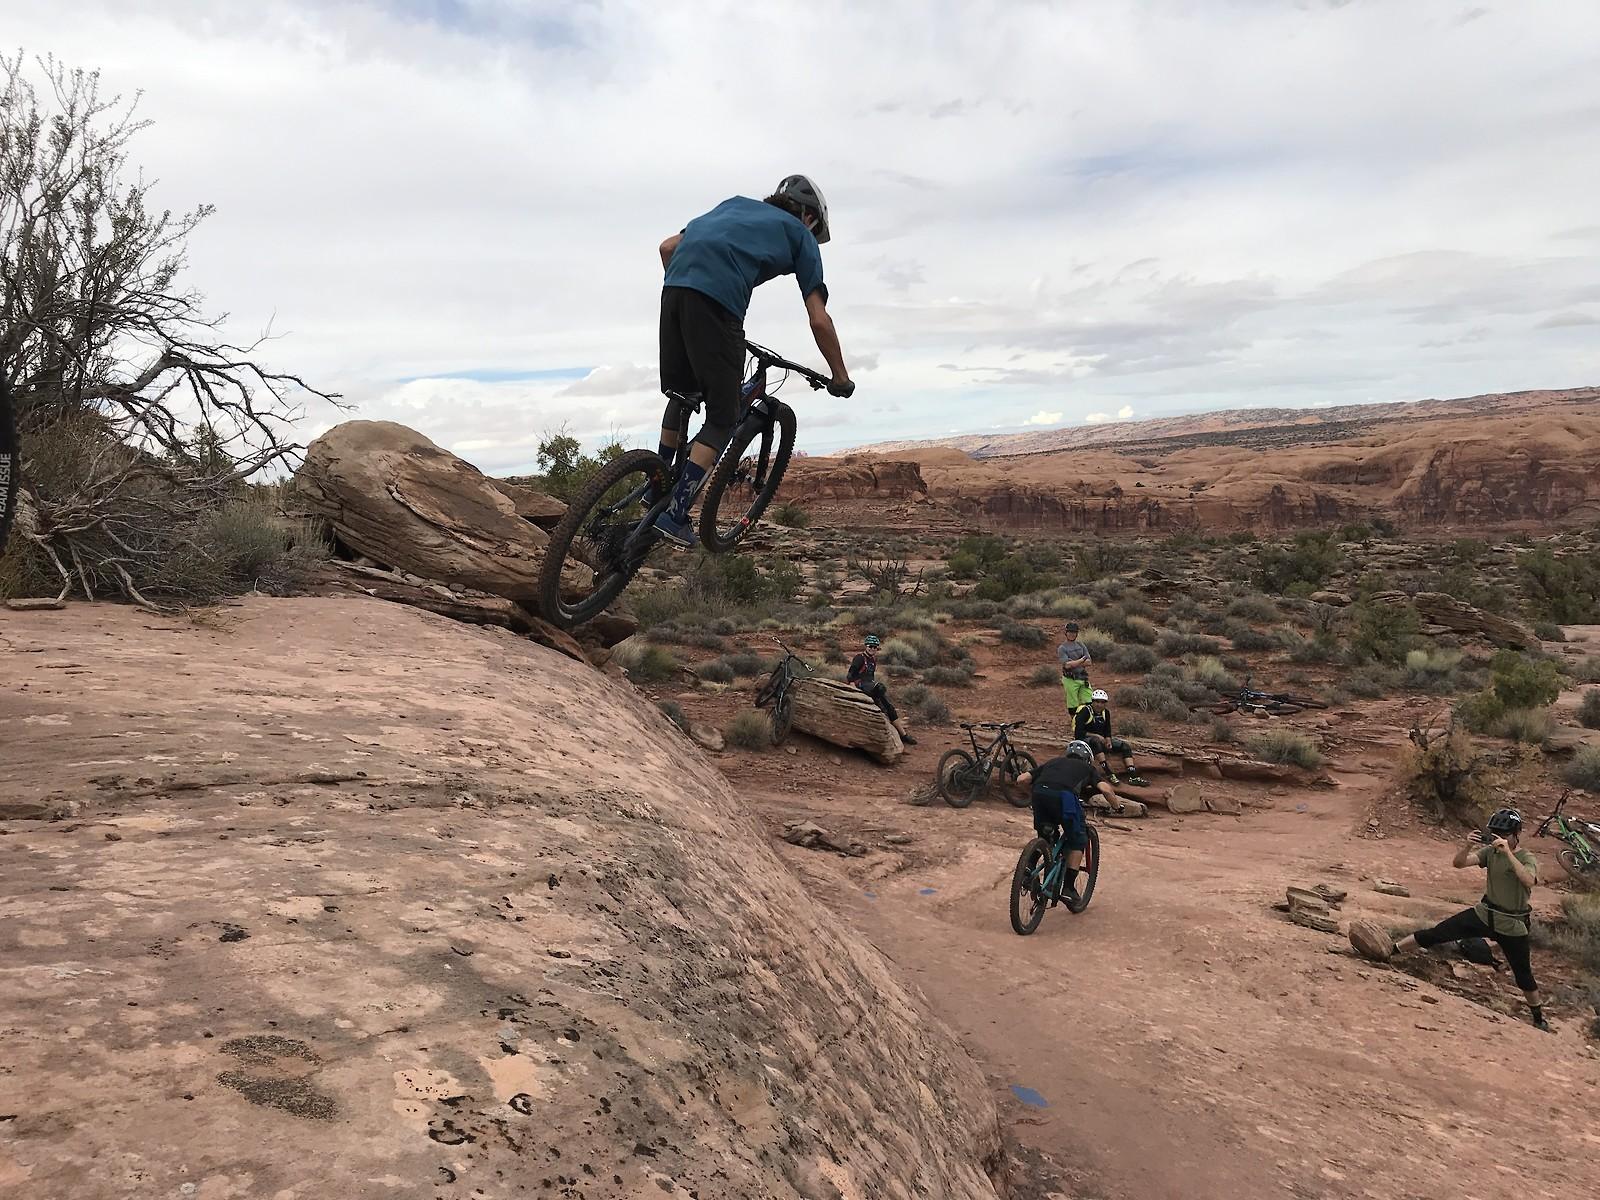 2018-10-23 14 49 36-1 - FlowyMcFlowerton - Mountain Biking Pictures - Vital MTB